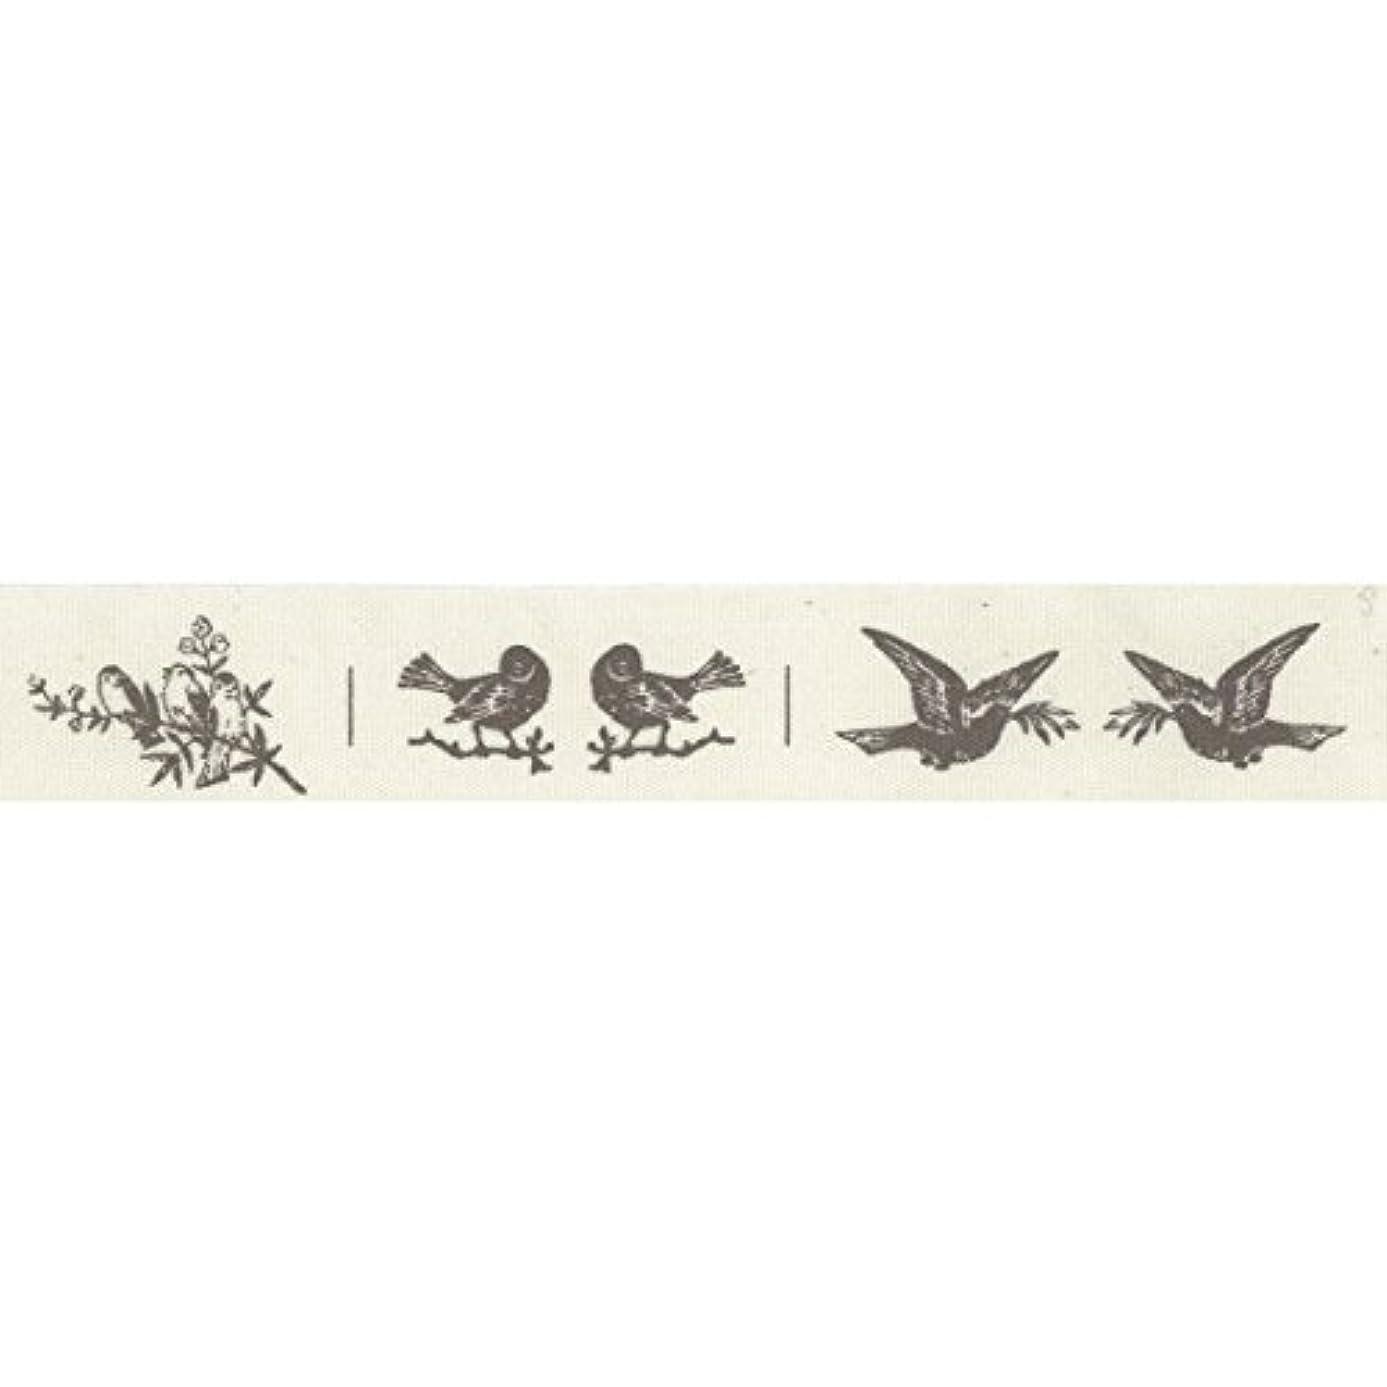 Vaessen Creative Printed Ribbon, Fabric, Ecru/Black, One Size